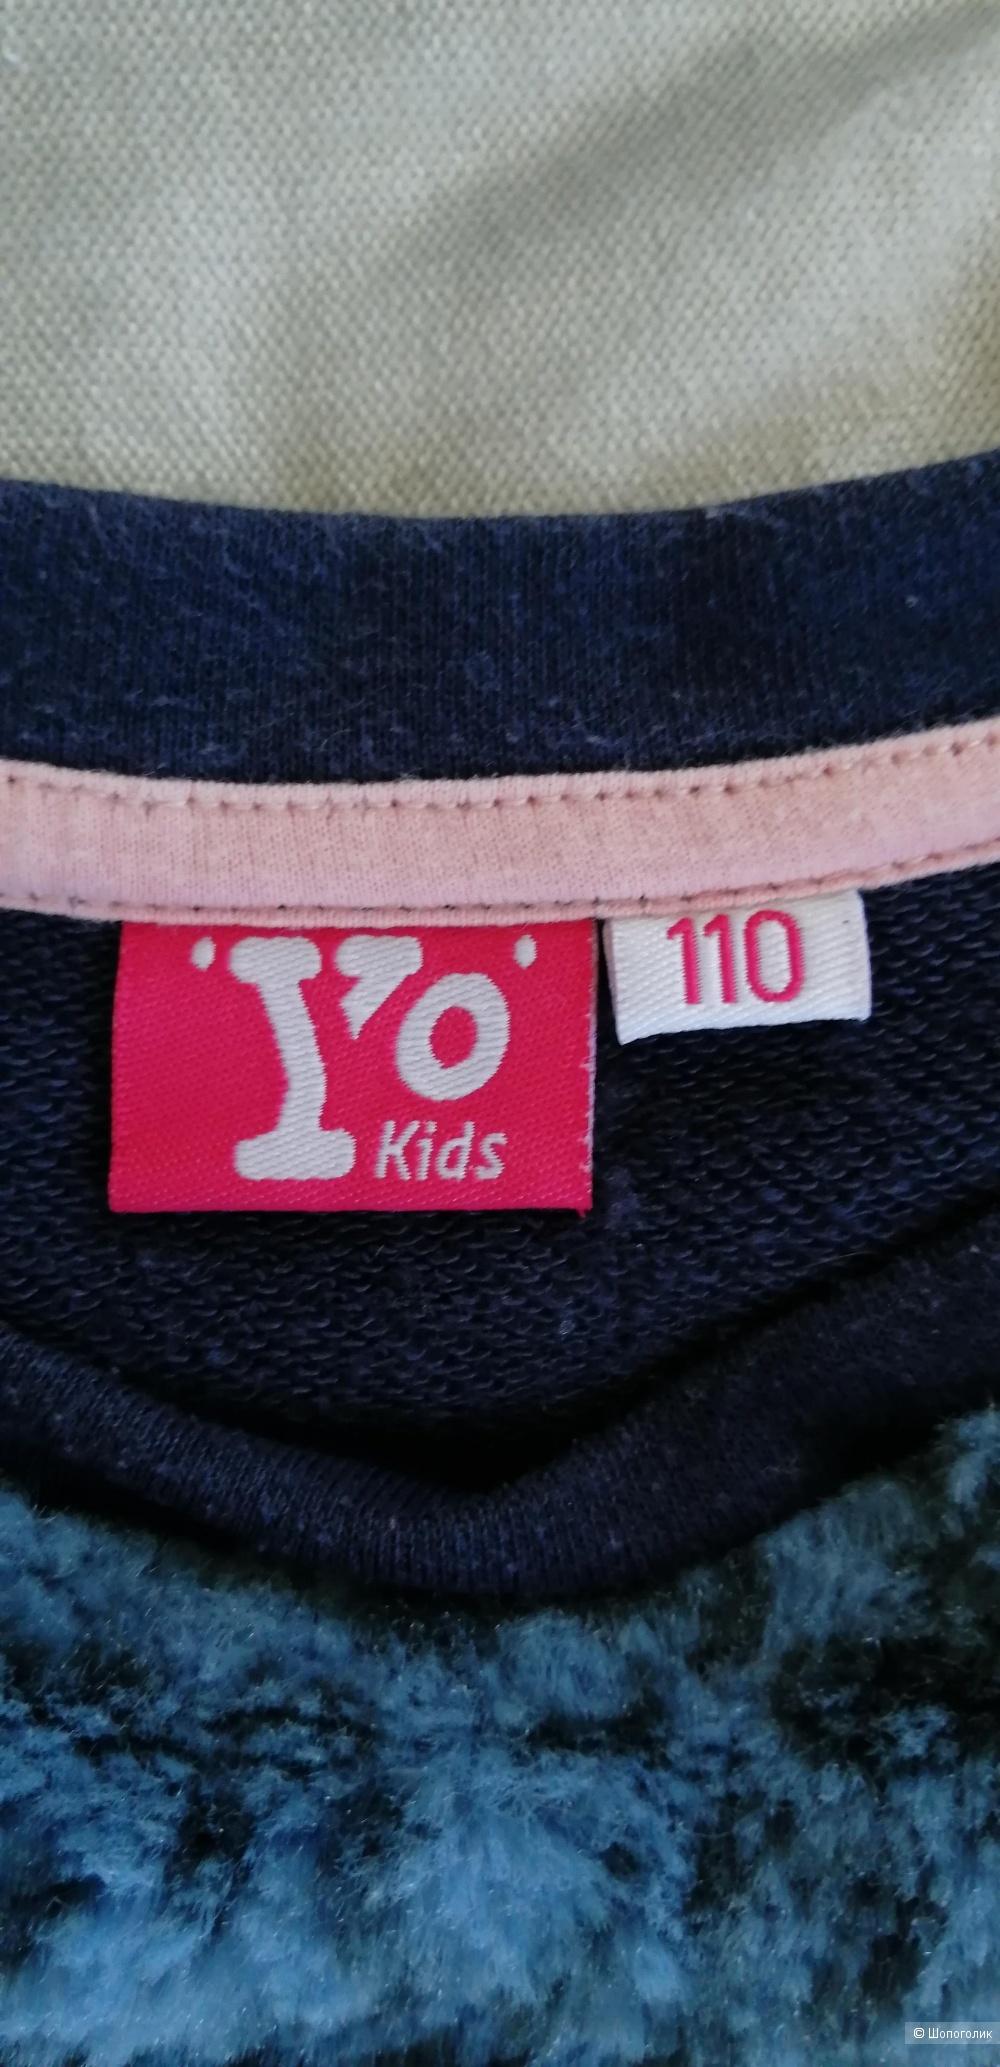 Свитер Yo kids 110